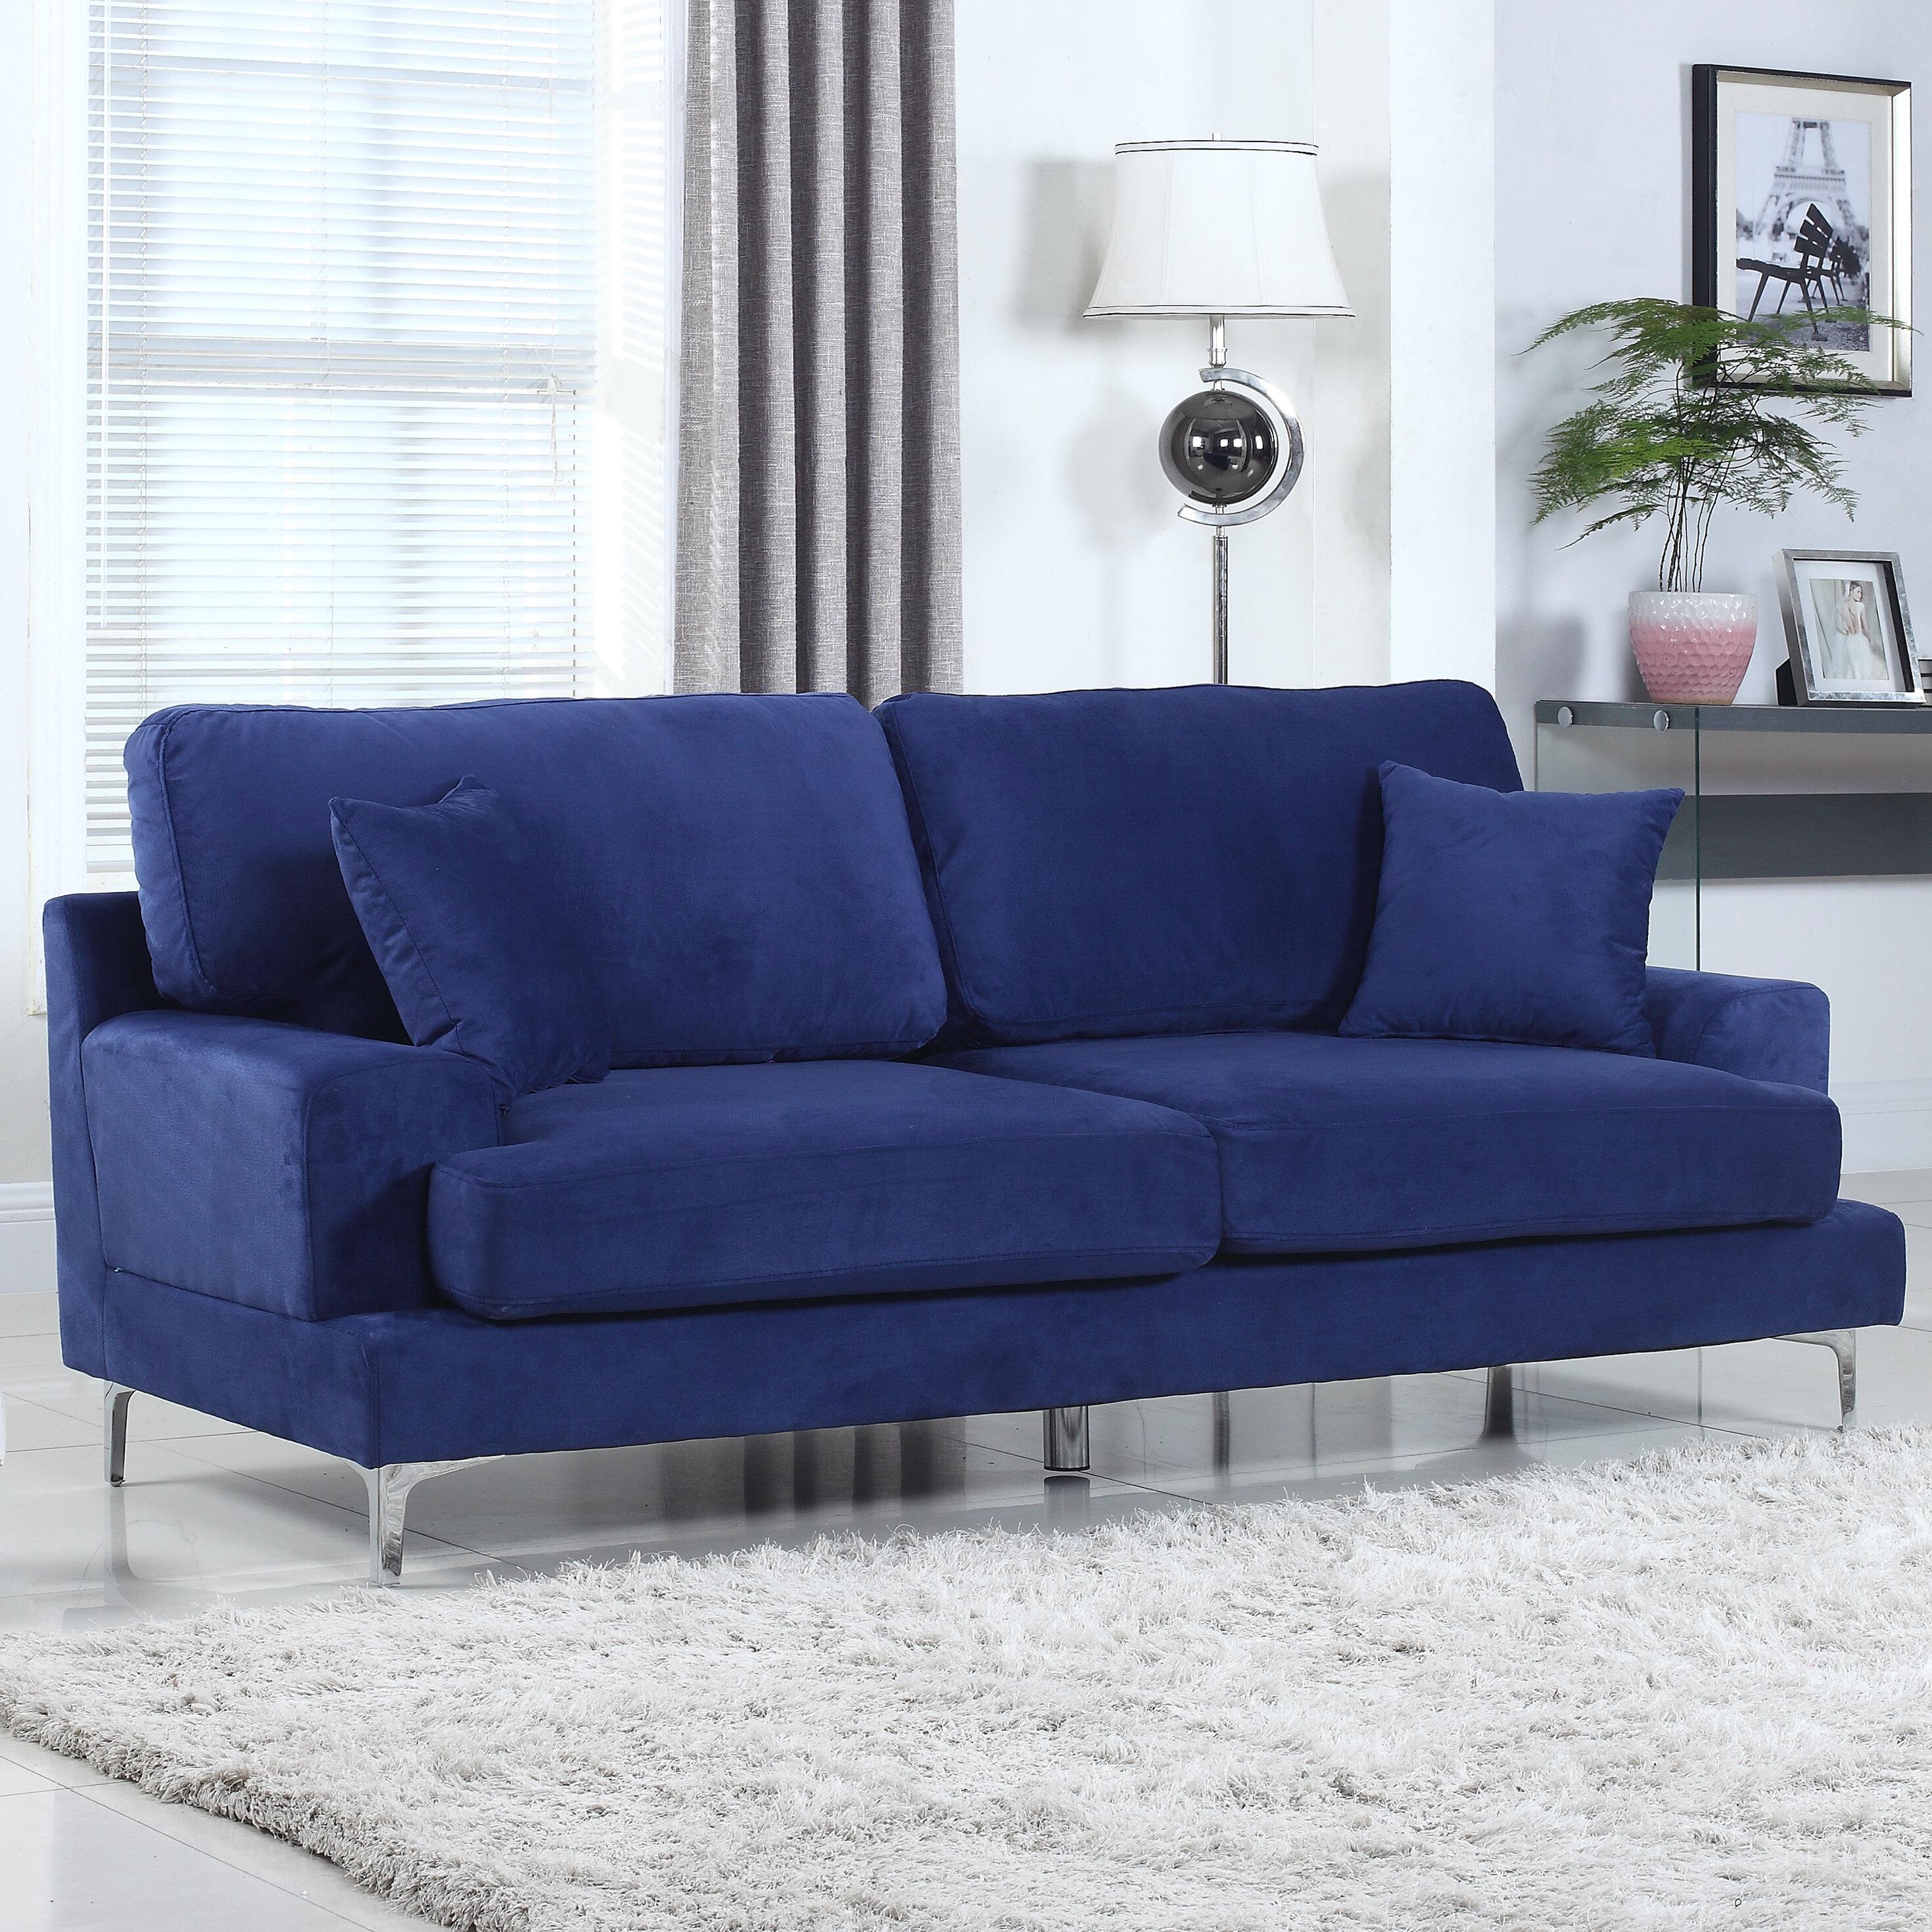 dp bonded mid kitchen century living furniture sofa amazon com room leather modern divano roma dining